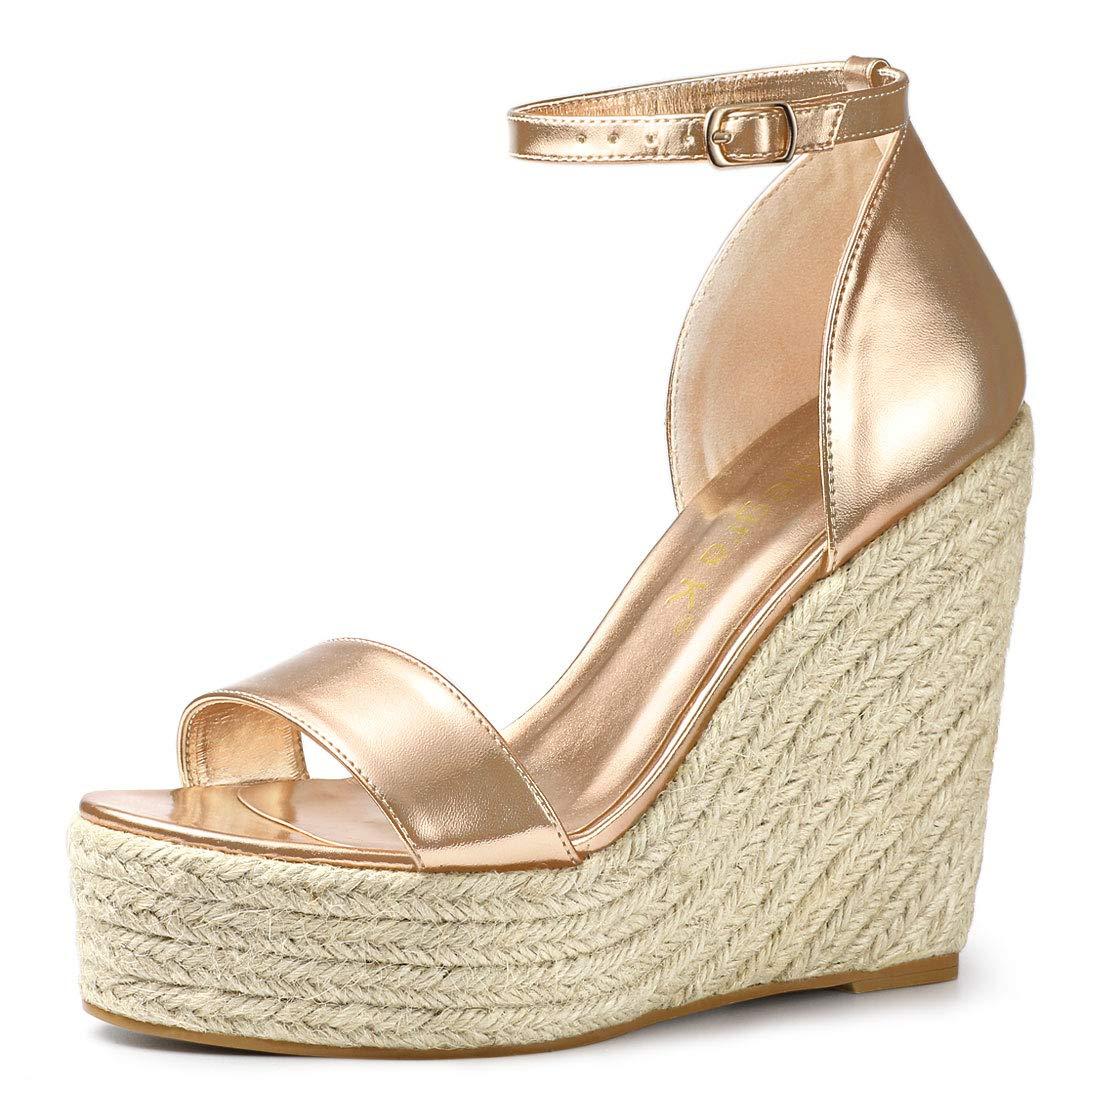 5bb76aff9 Allegra K Women's Espadrille Wedges Rose Gold Platform Sandals - 9 M US:  Buy Online at Low Prices in India - Amazon.in